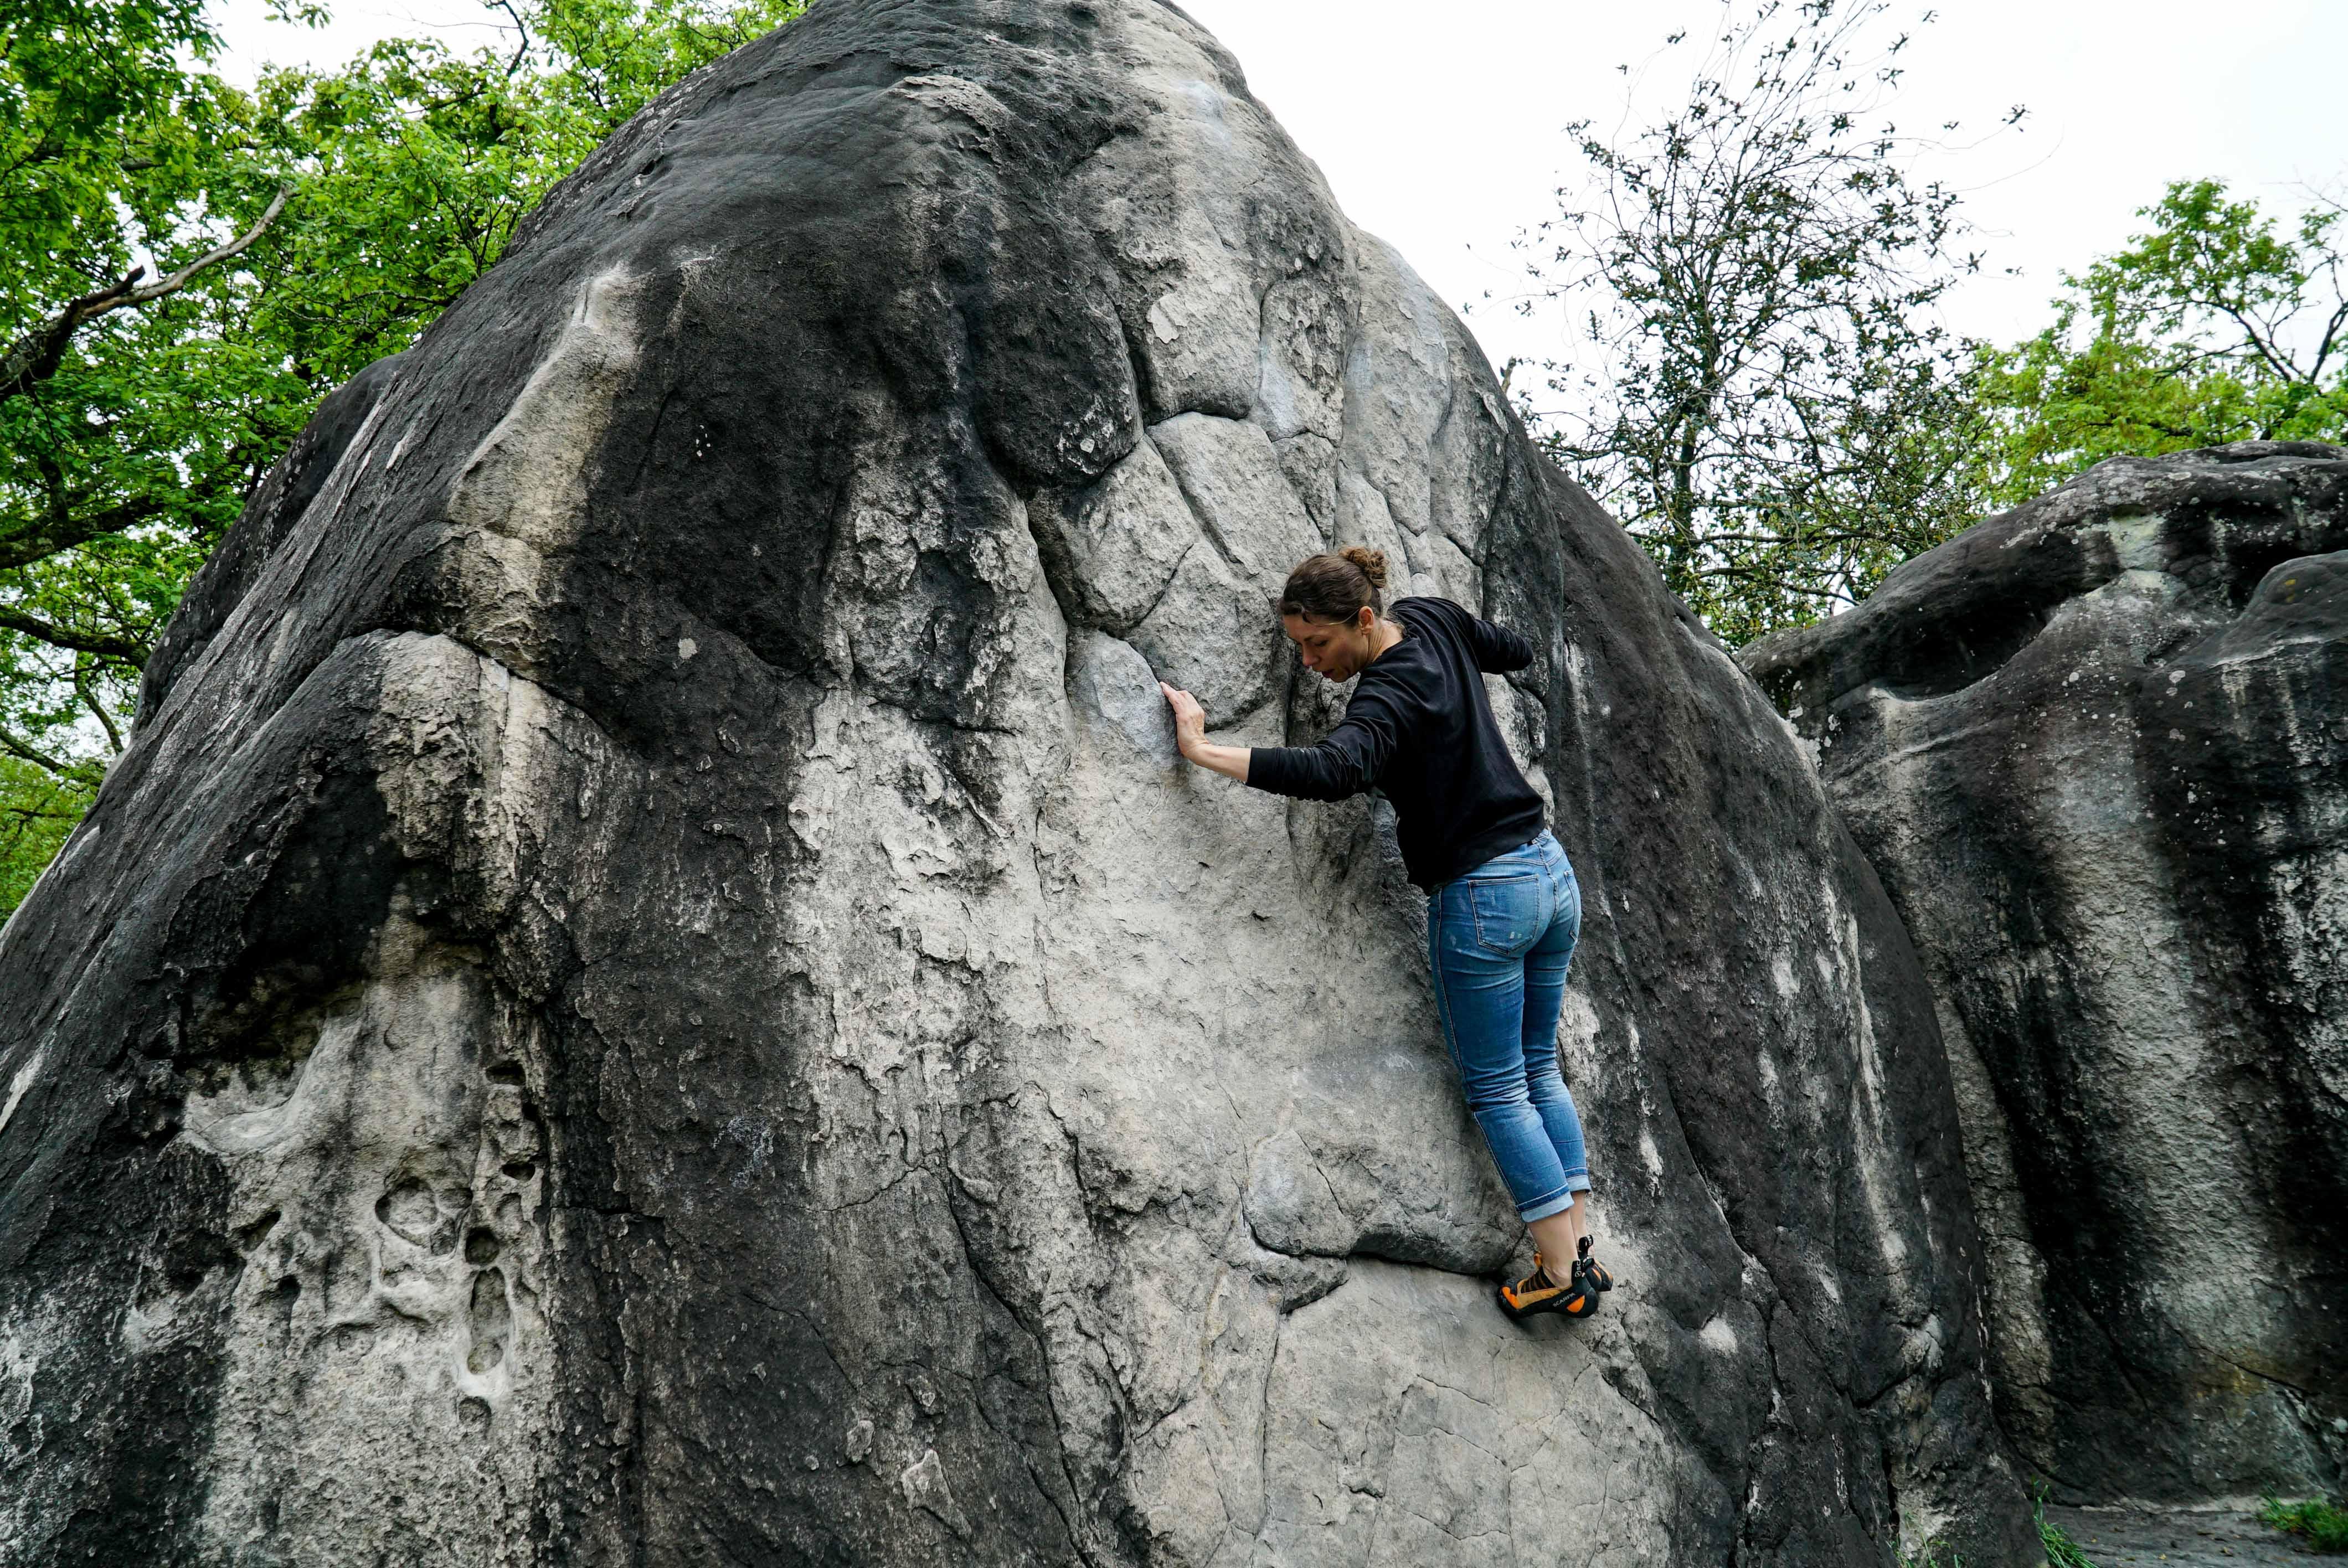 fontainbleau climbing 2016 mike brindley-43